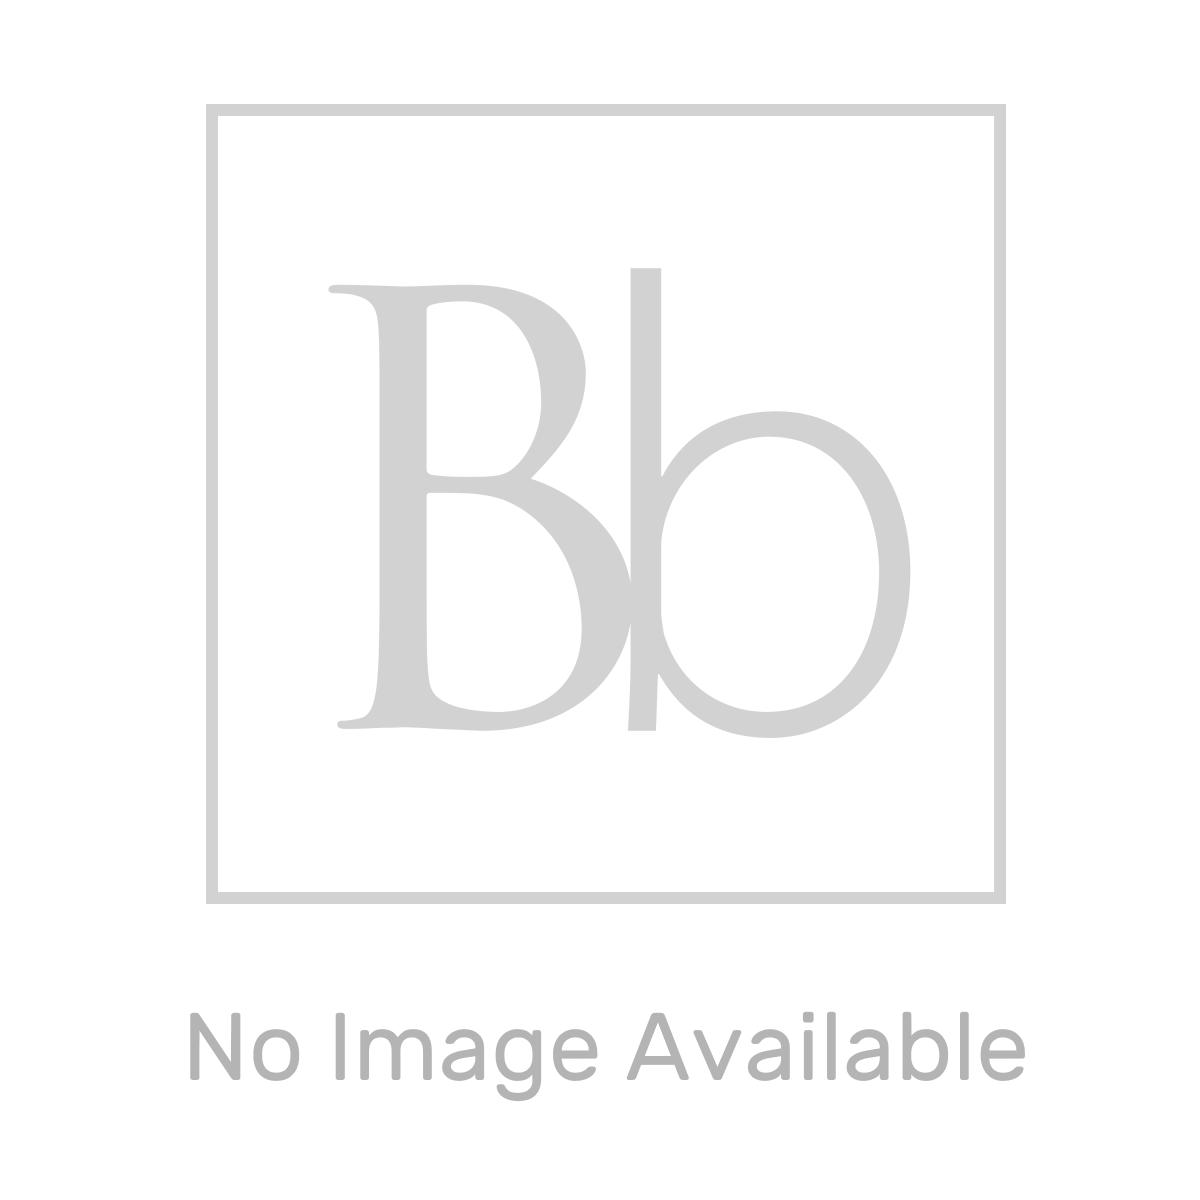 Aquadart Grey Slate Shower Tray 1700 x 900 Overhead